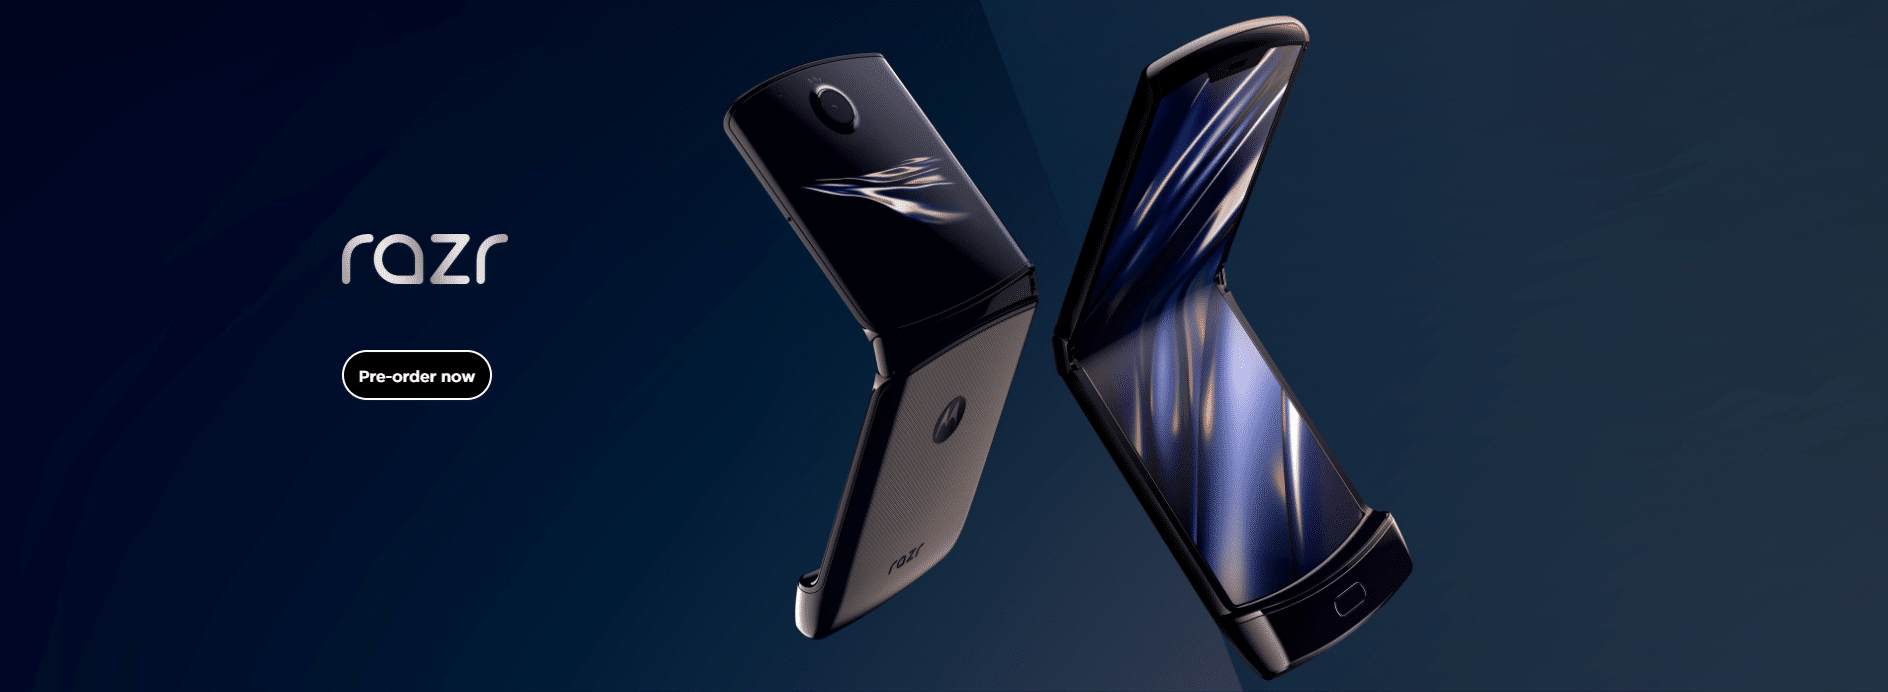 Motorola Razr 2019 Schweiz vorbestellen